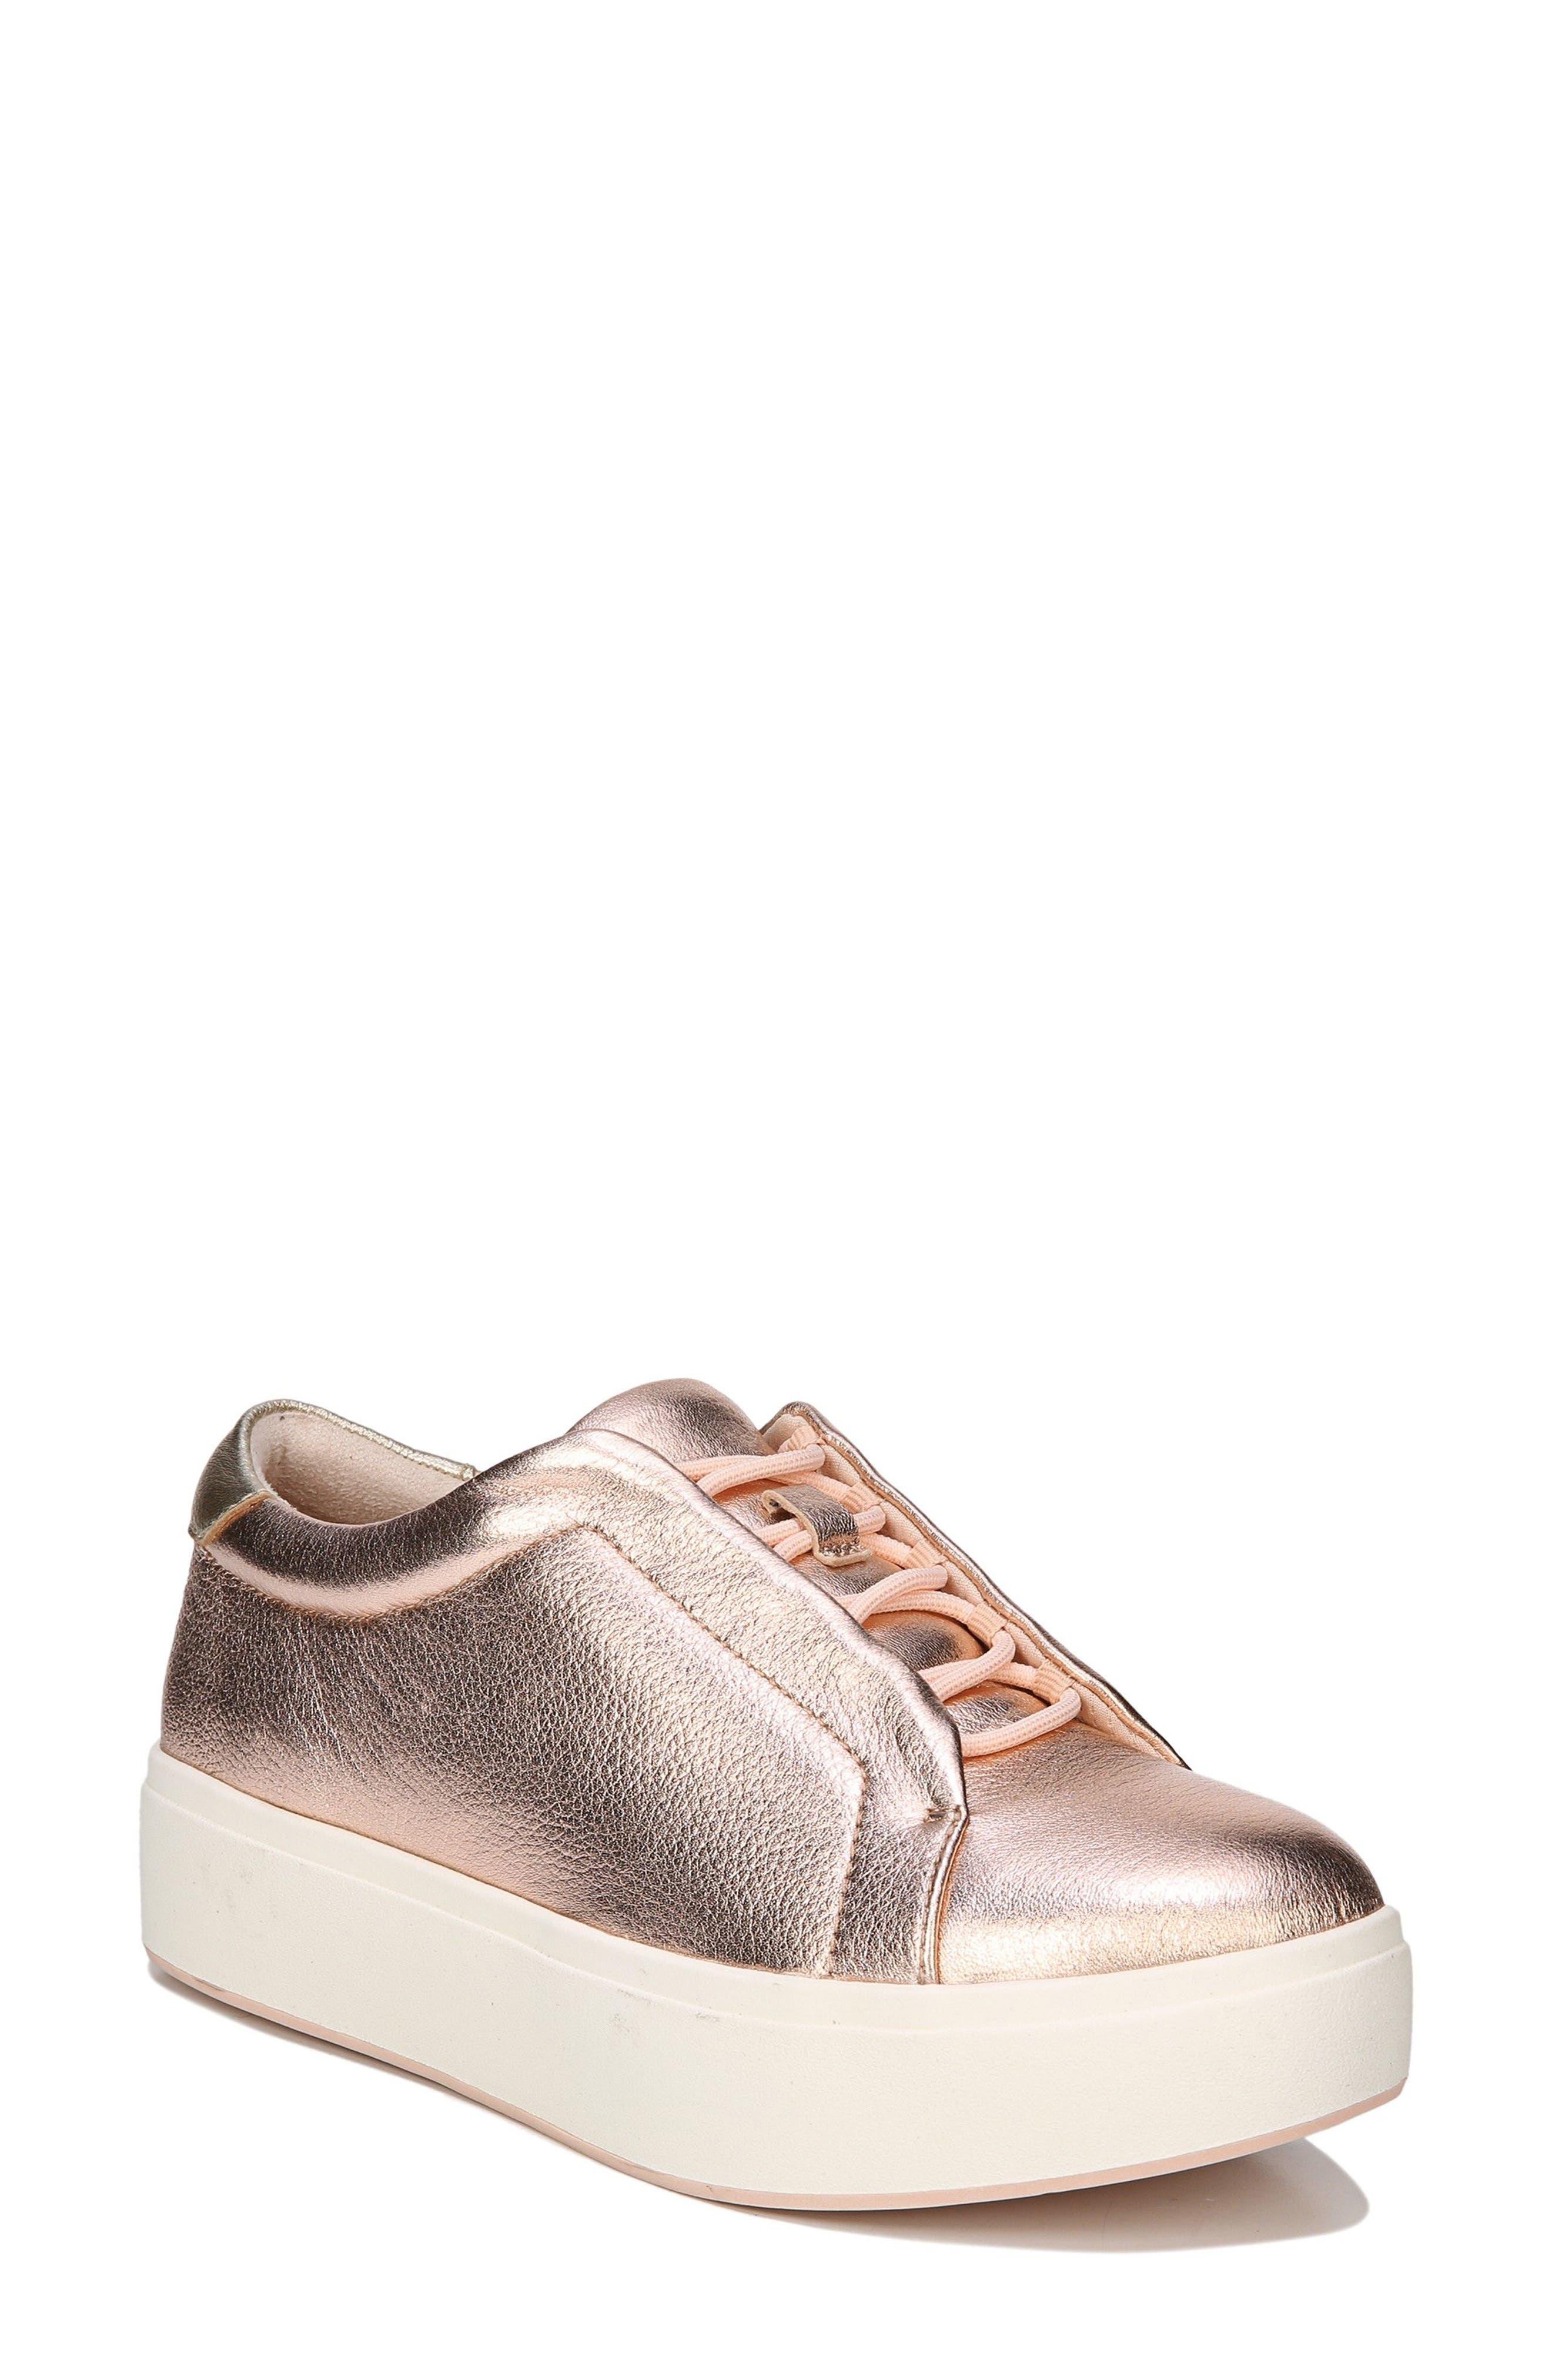 Alternate Image 1 Selected - Dr. Scholl's Abbot Sneaker (Women)